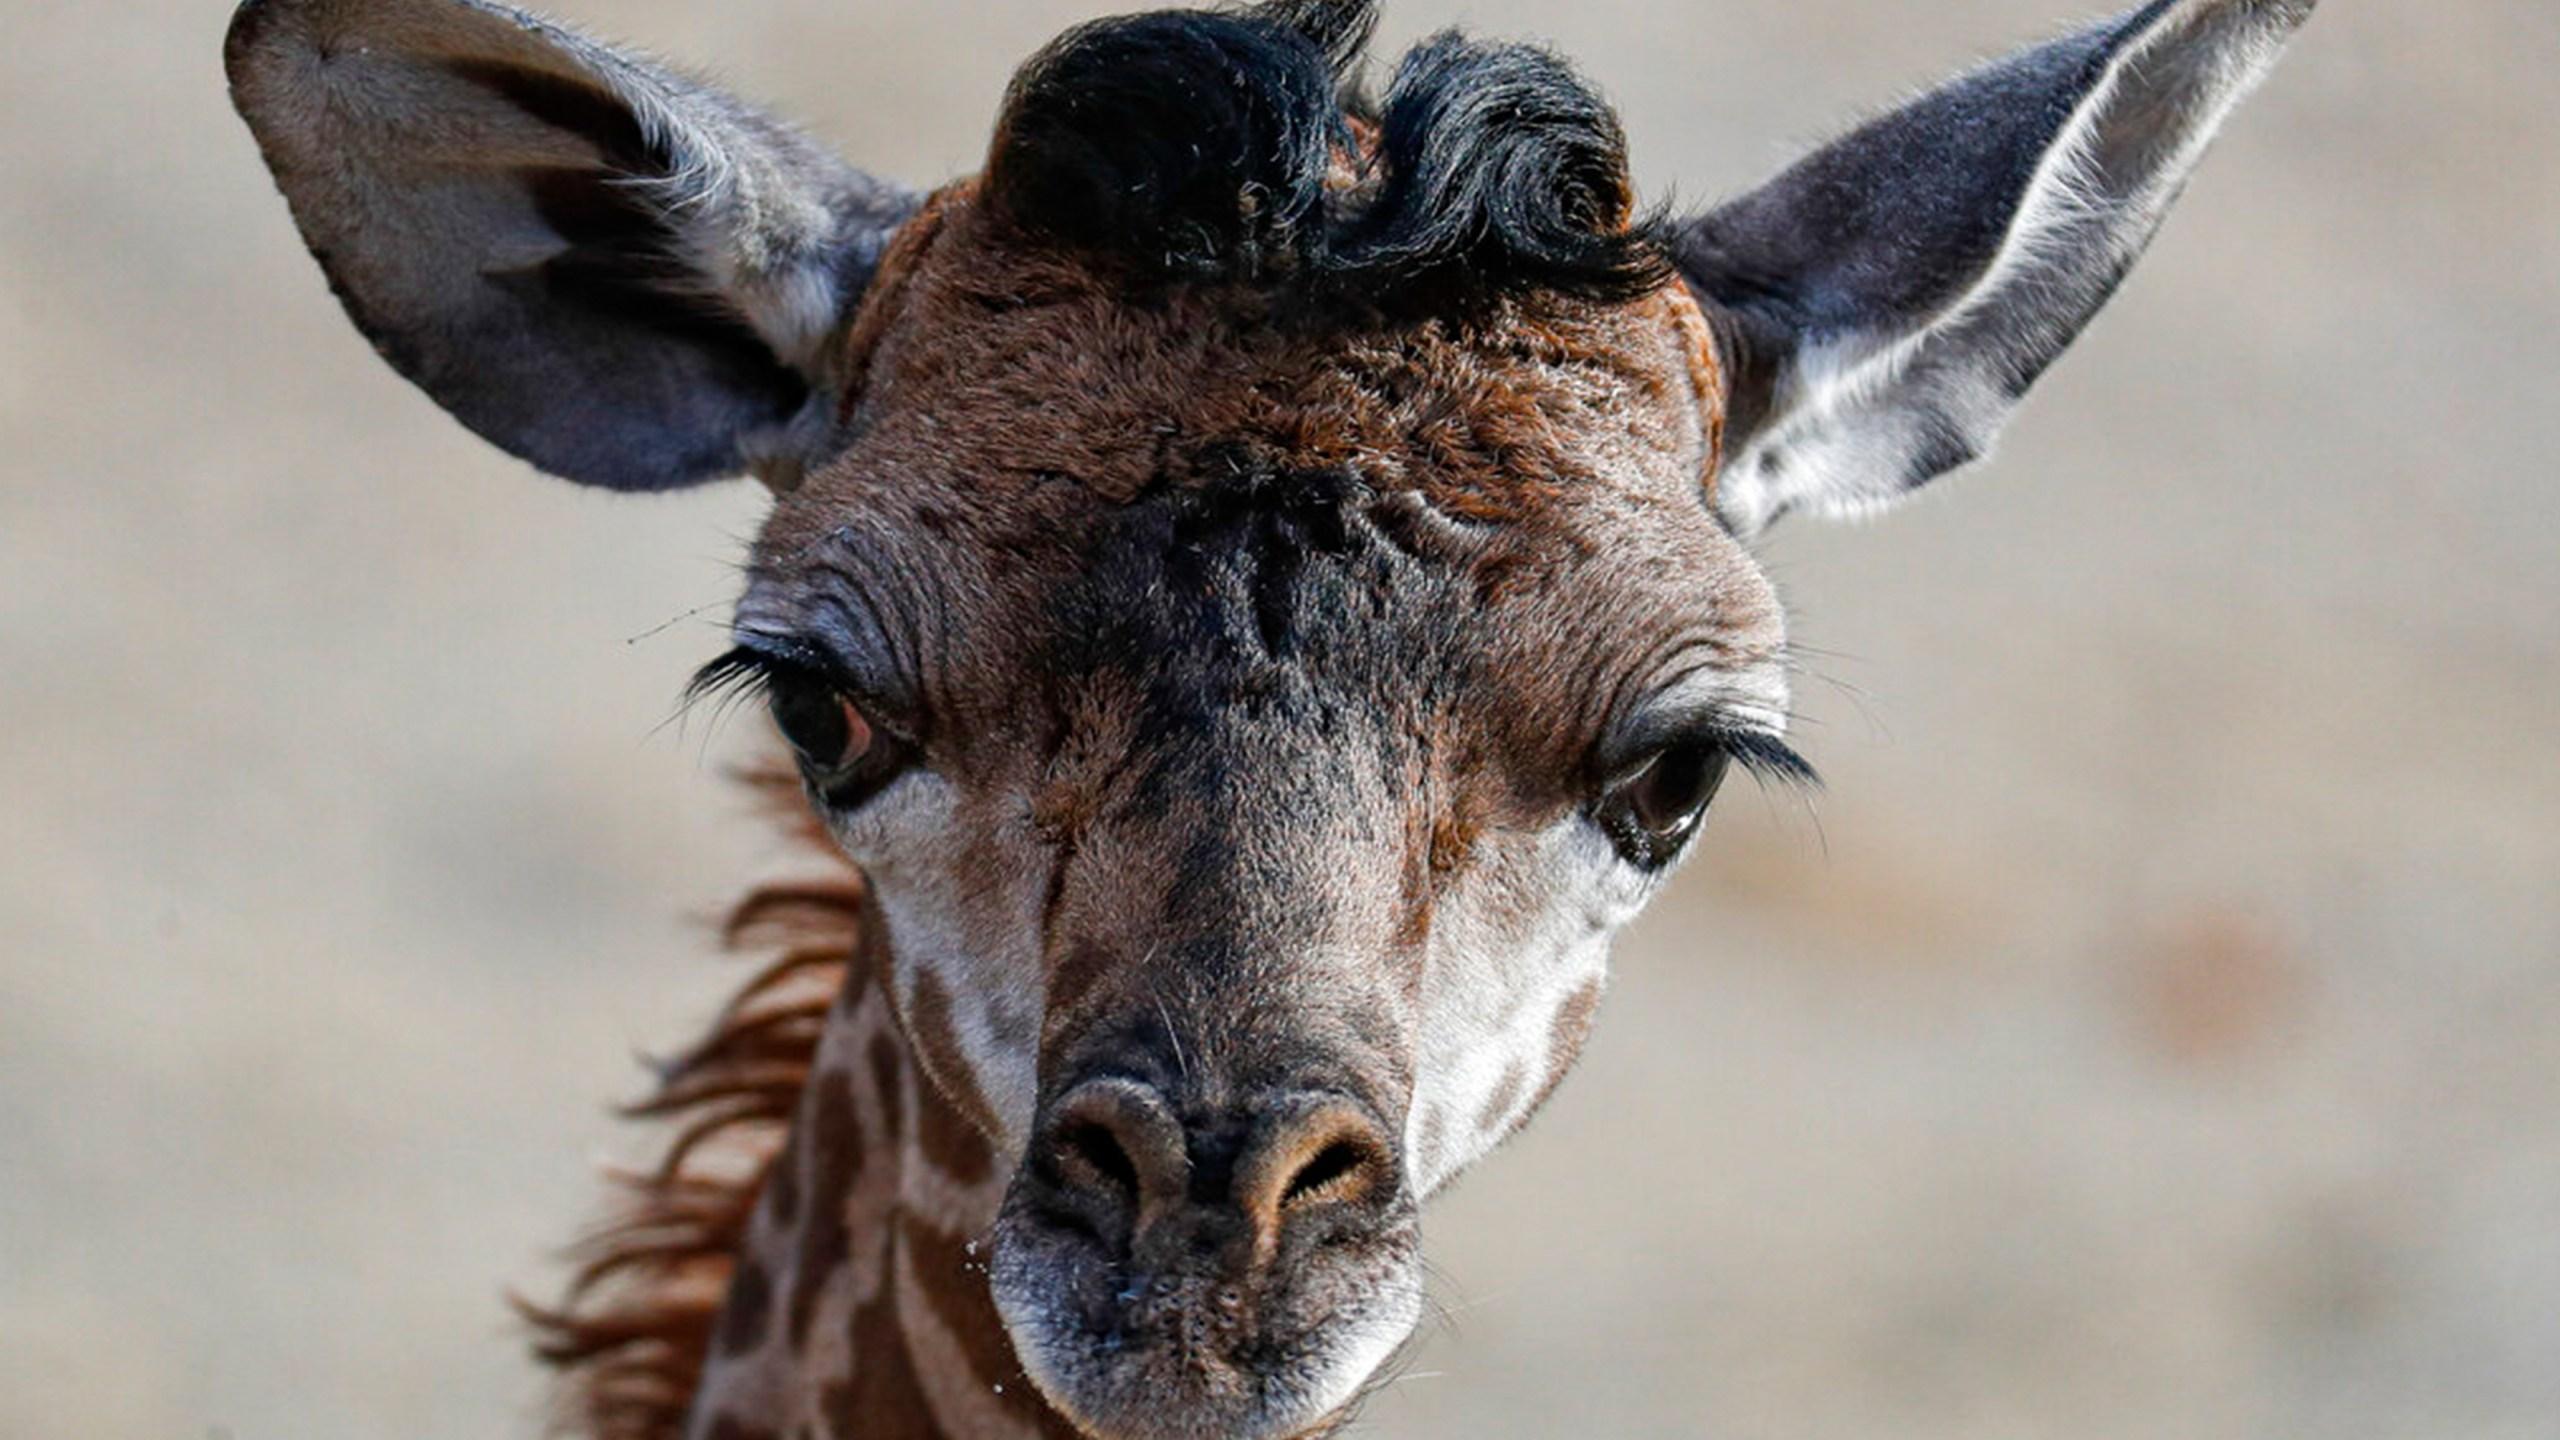 Theo the Giraffe